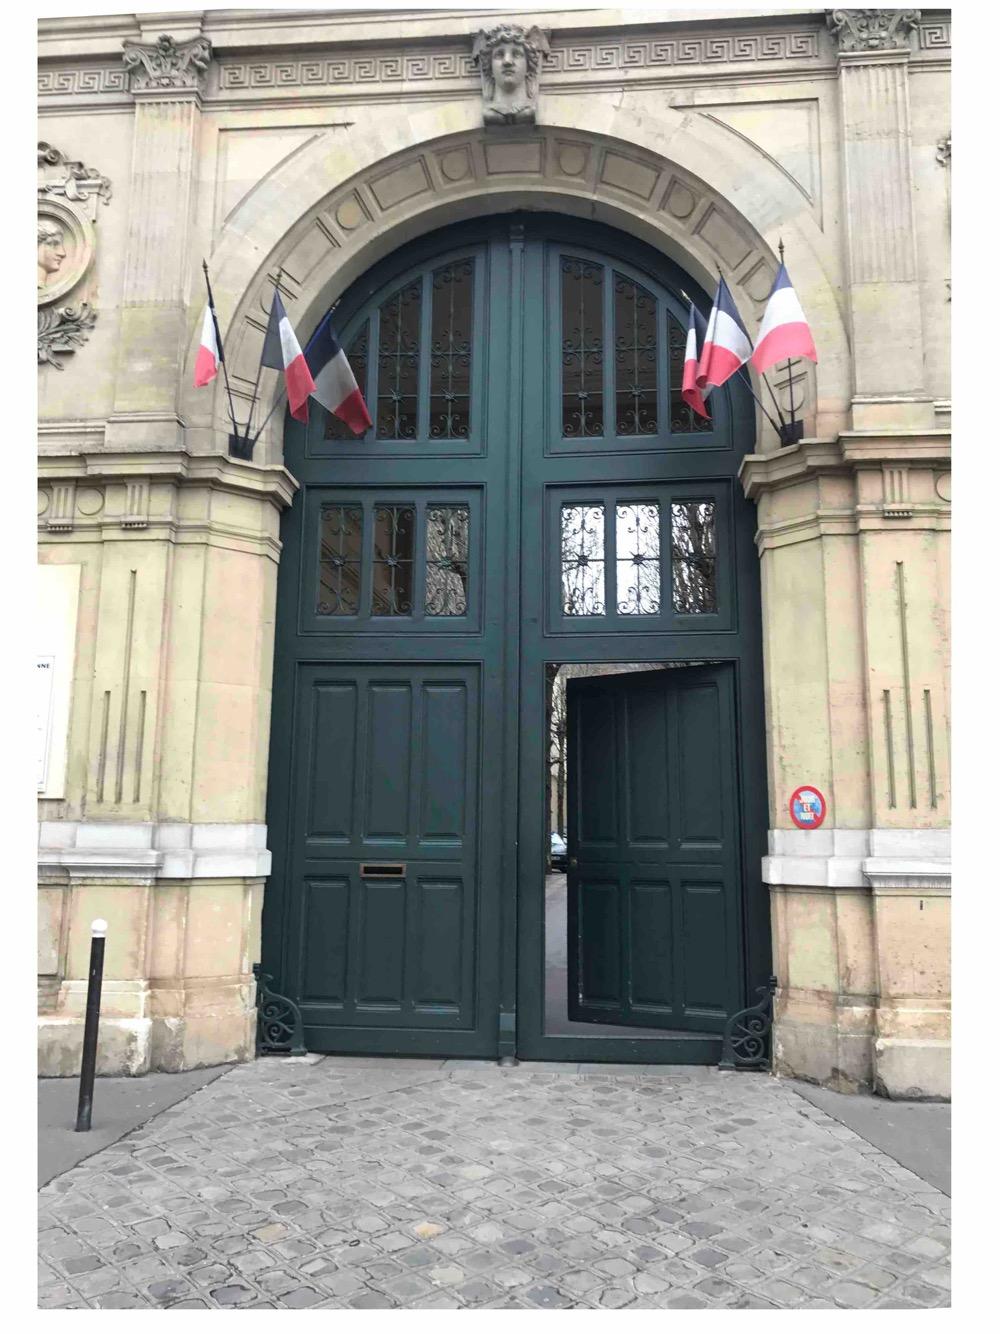 Porte Monumentale Av De Villiers - Paris 17